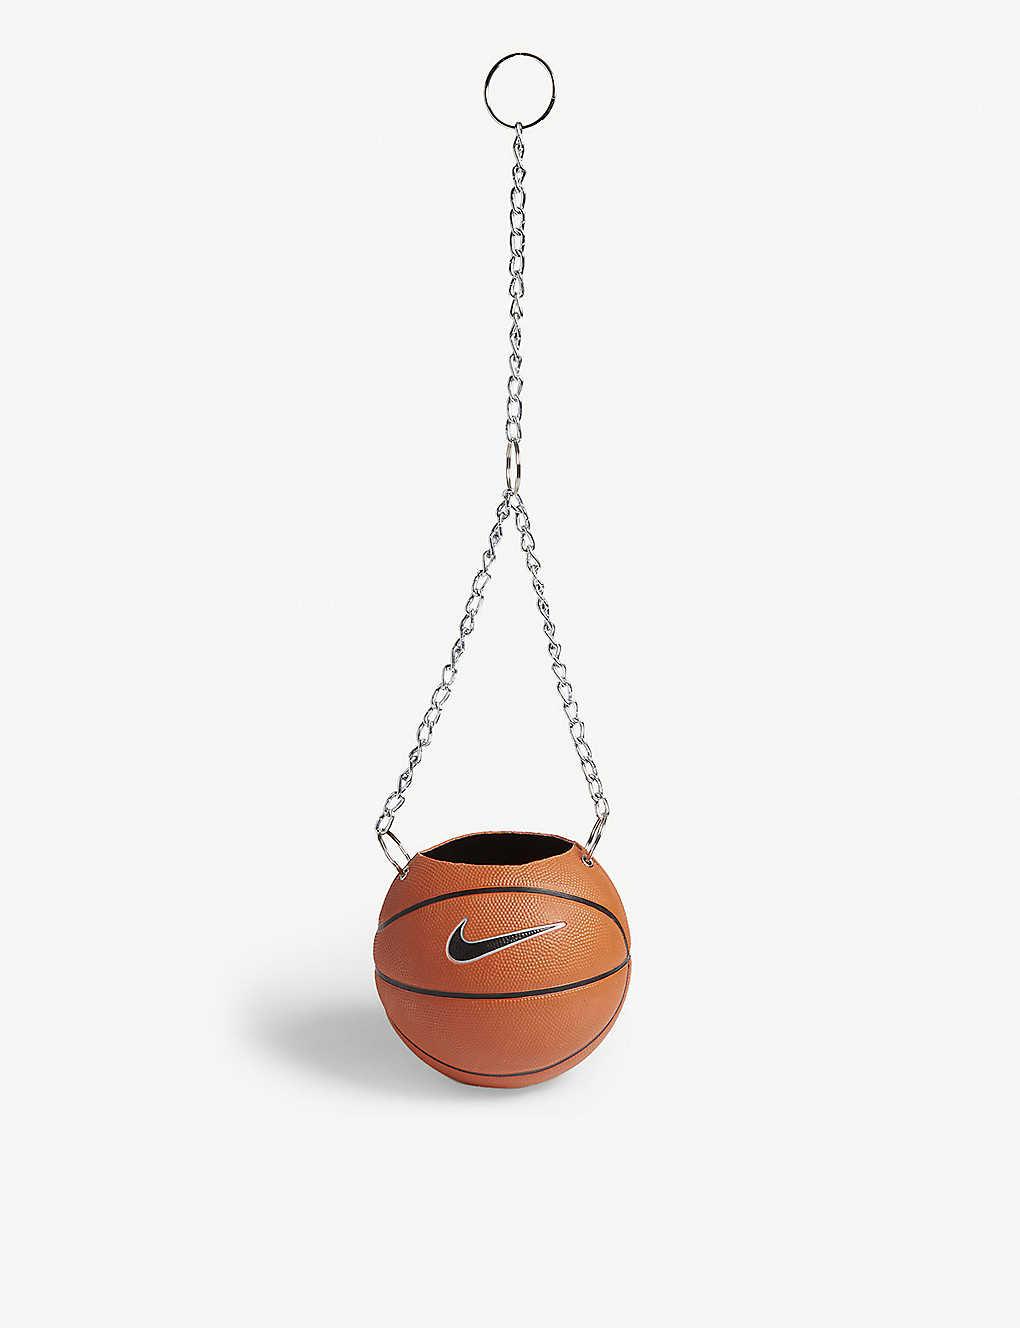 4a6bcde90804 BODEGA ROSE - Nike basketball hanging planter